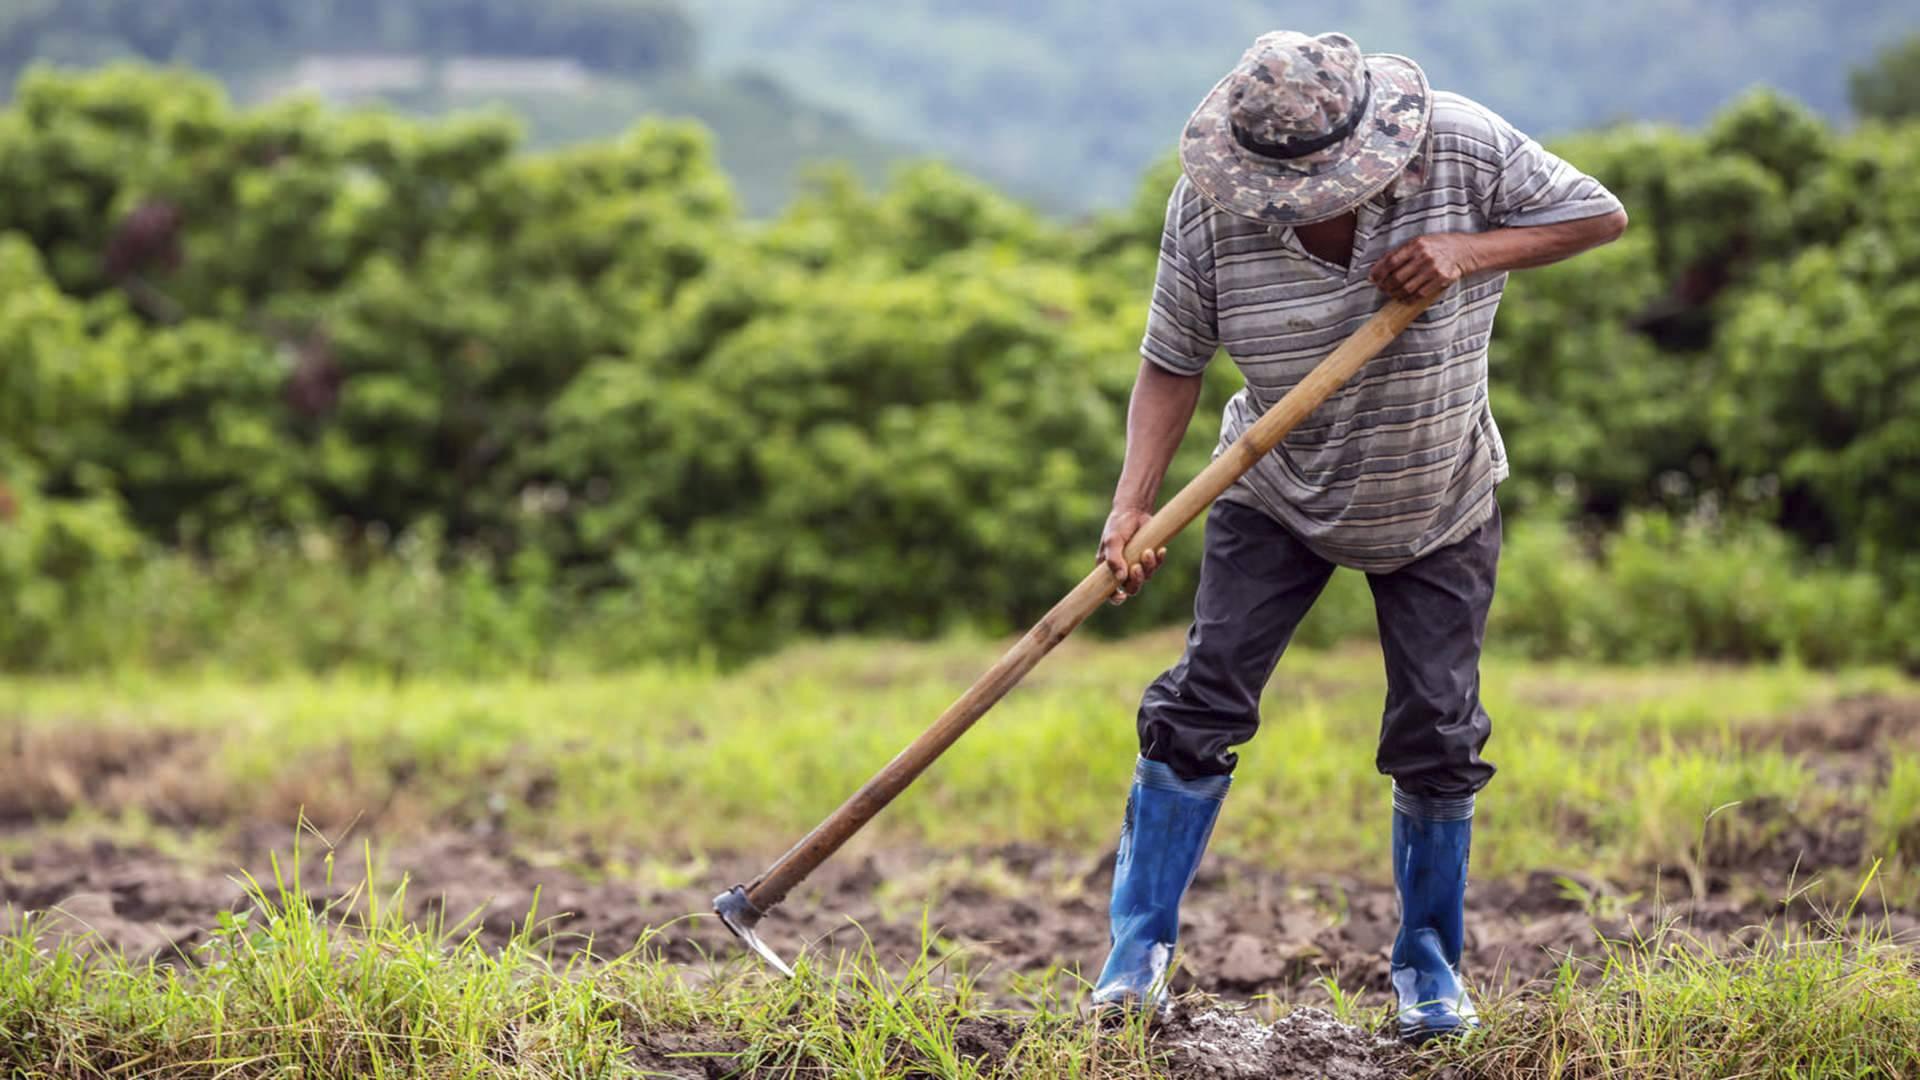 Produtor rural precisa emitir Certificado de Cadastro de Imóvel Rural